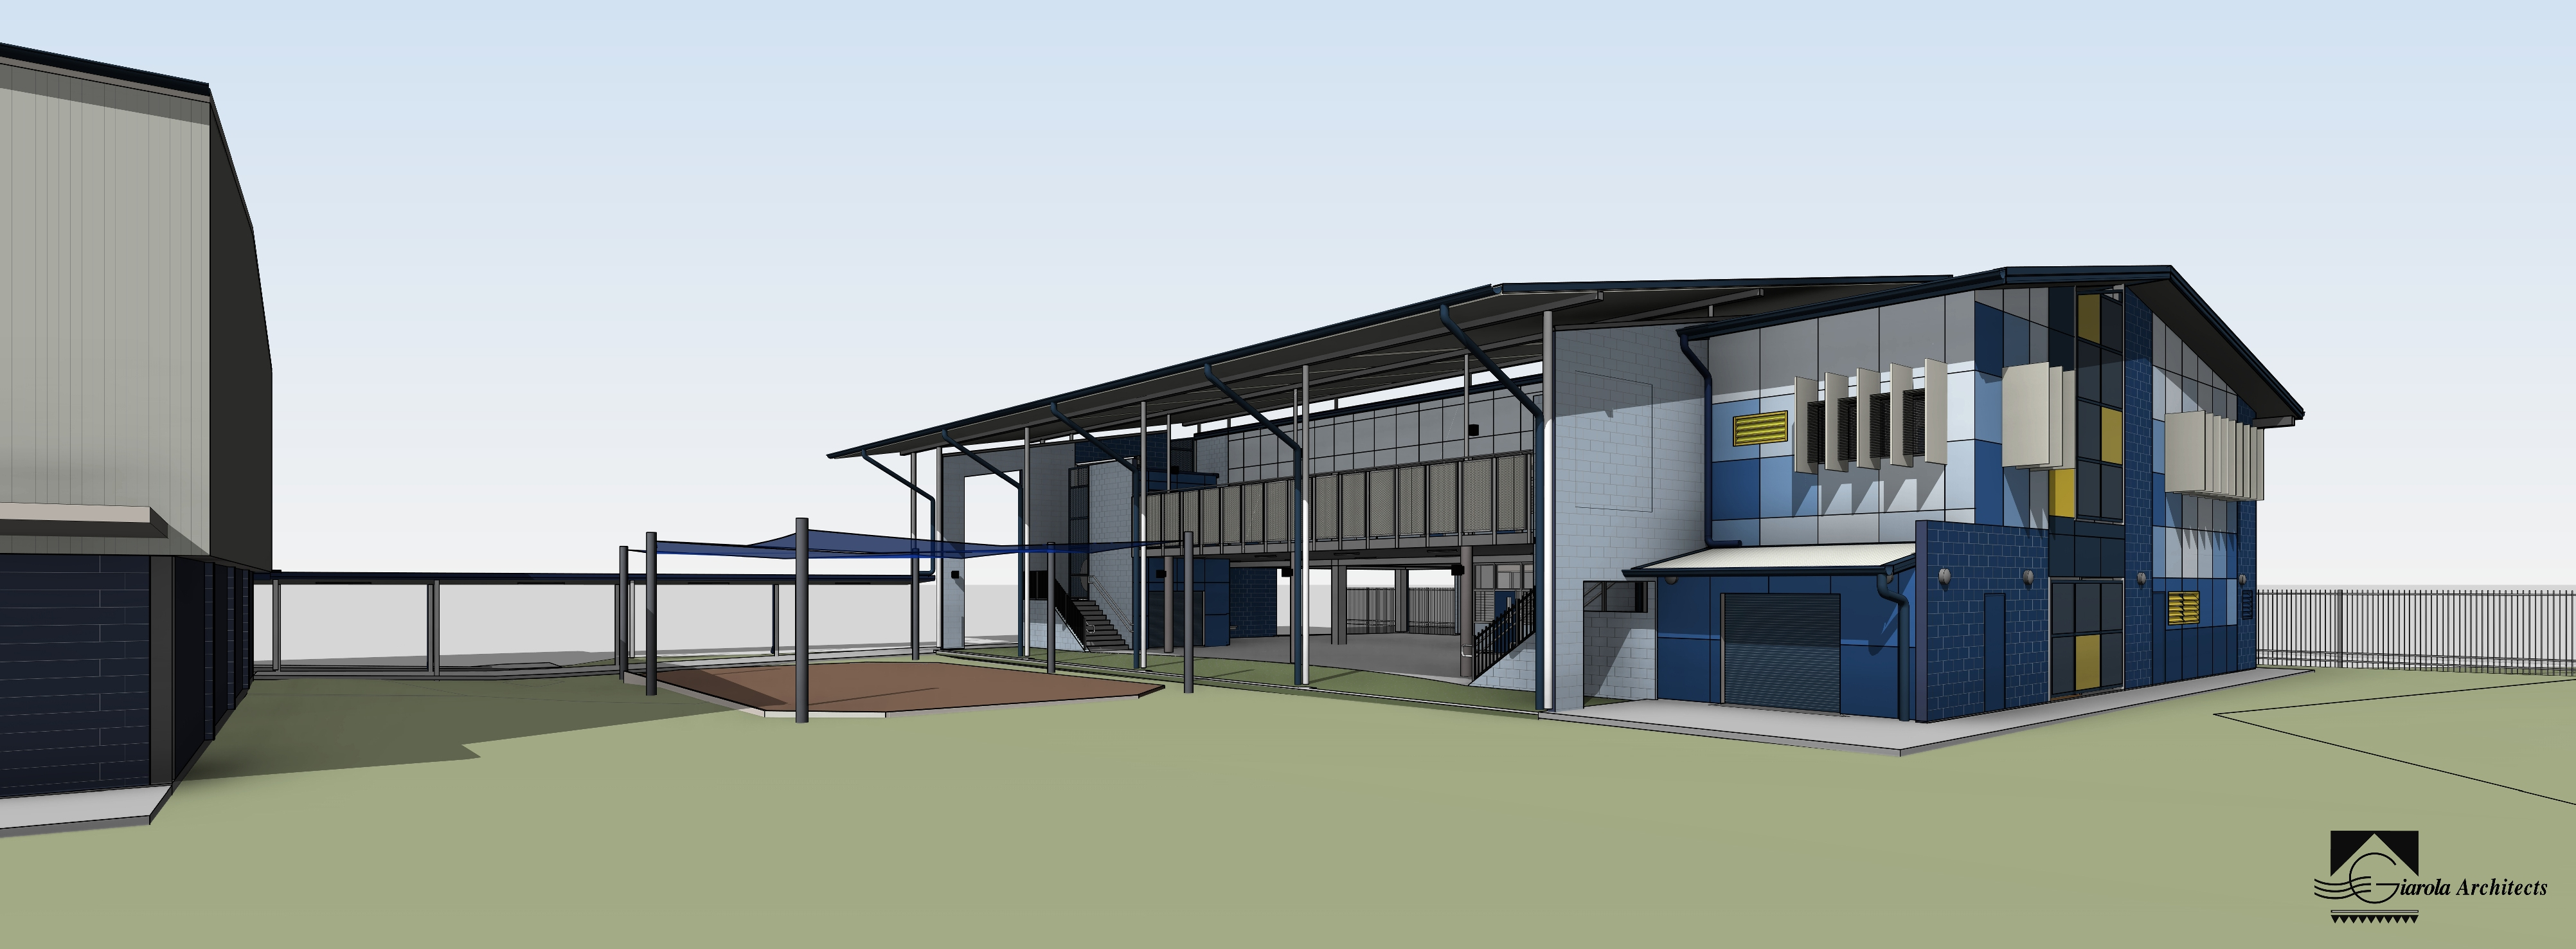 Concept Design, School Design, Brisbane School Design